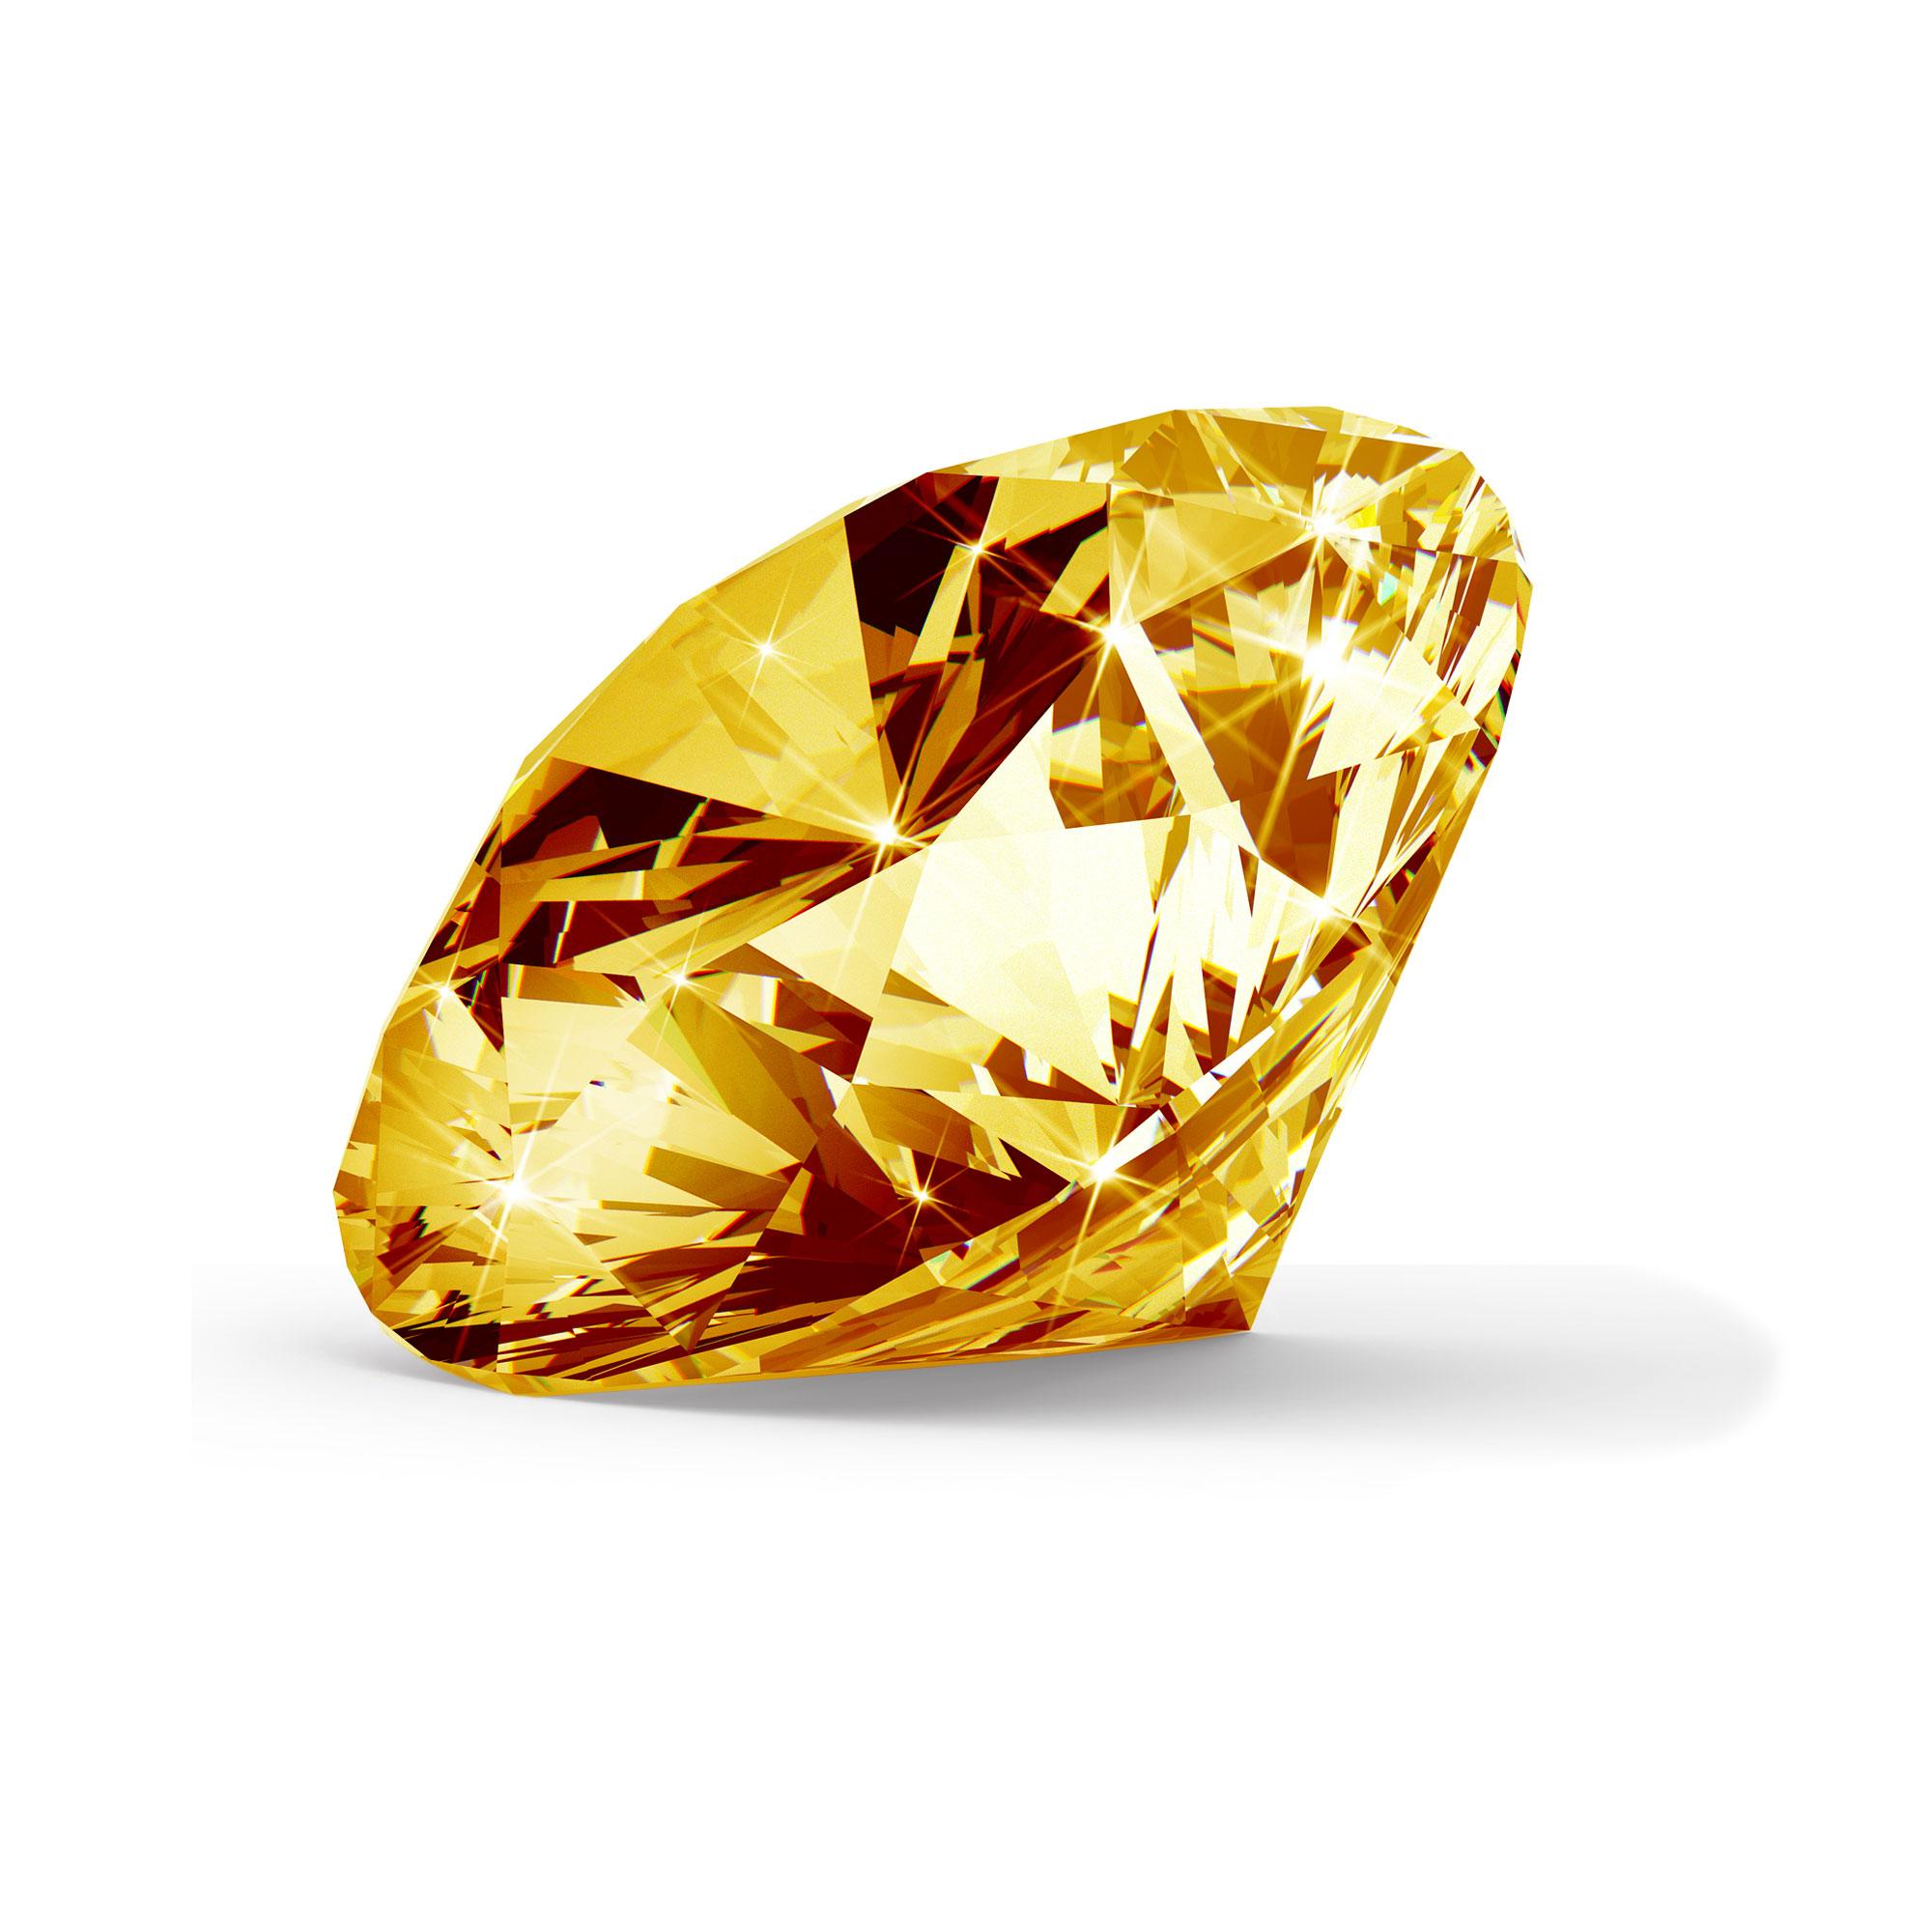 Orange/gul diamant brilliant round cut fra siden